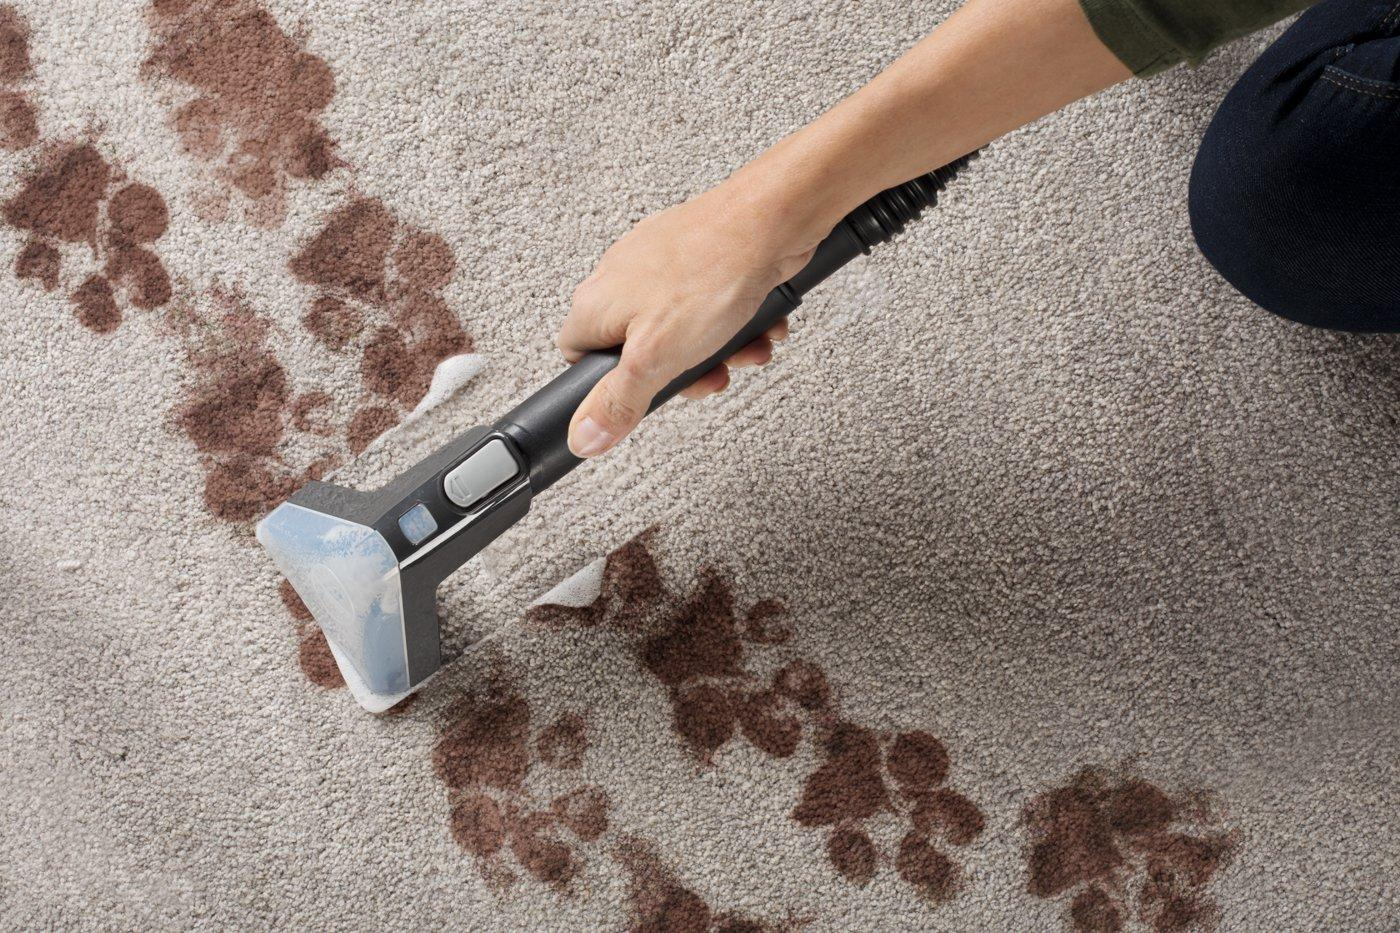 Power Scrub Elite Pet Carpet Cleaner5